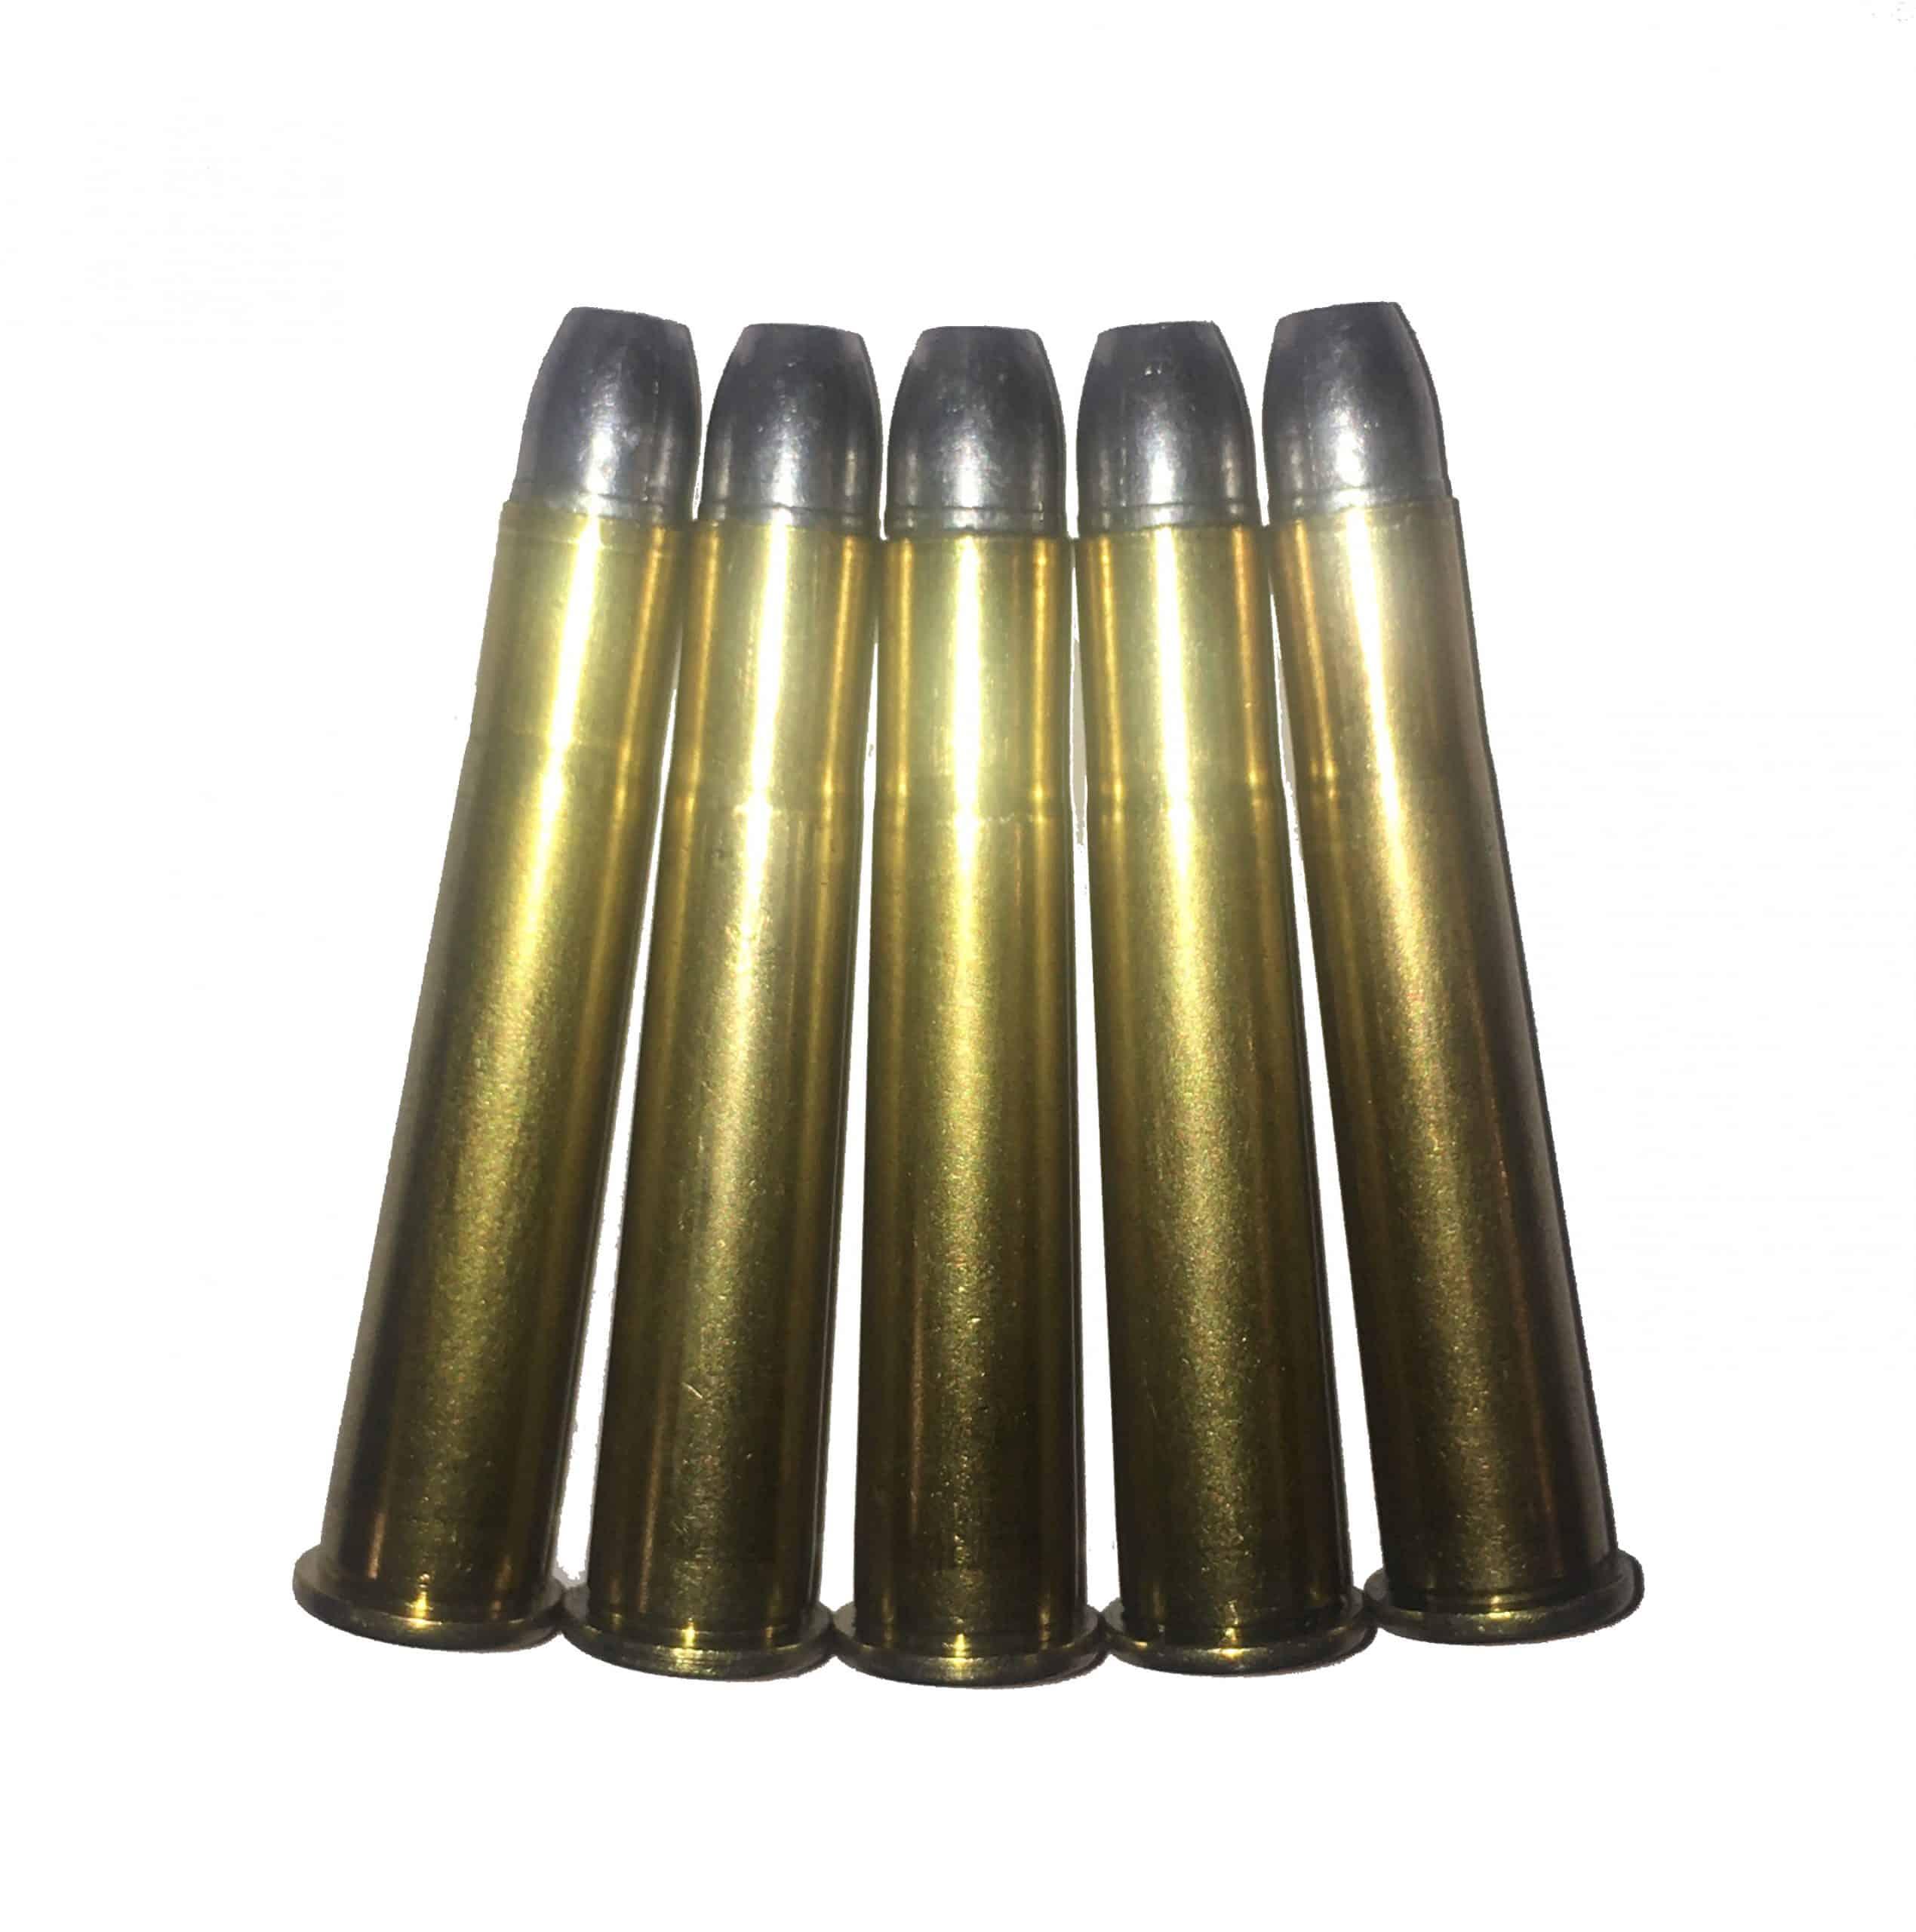 32-40 Winchester – Reloading Brass